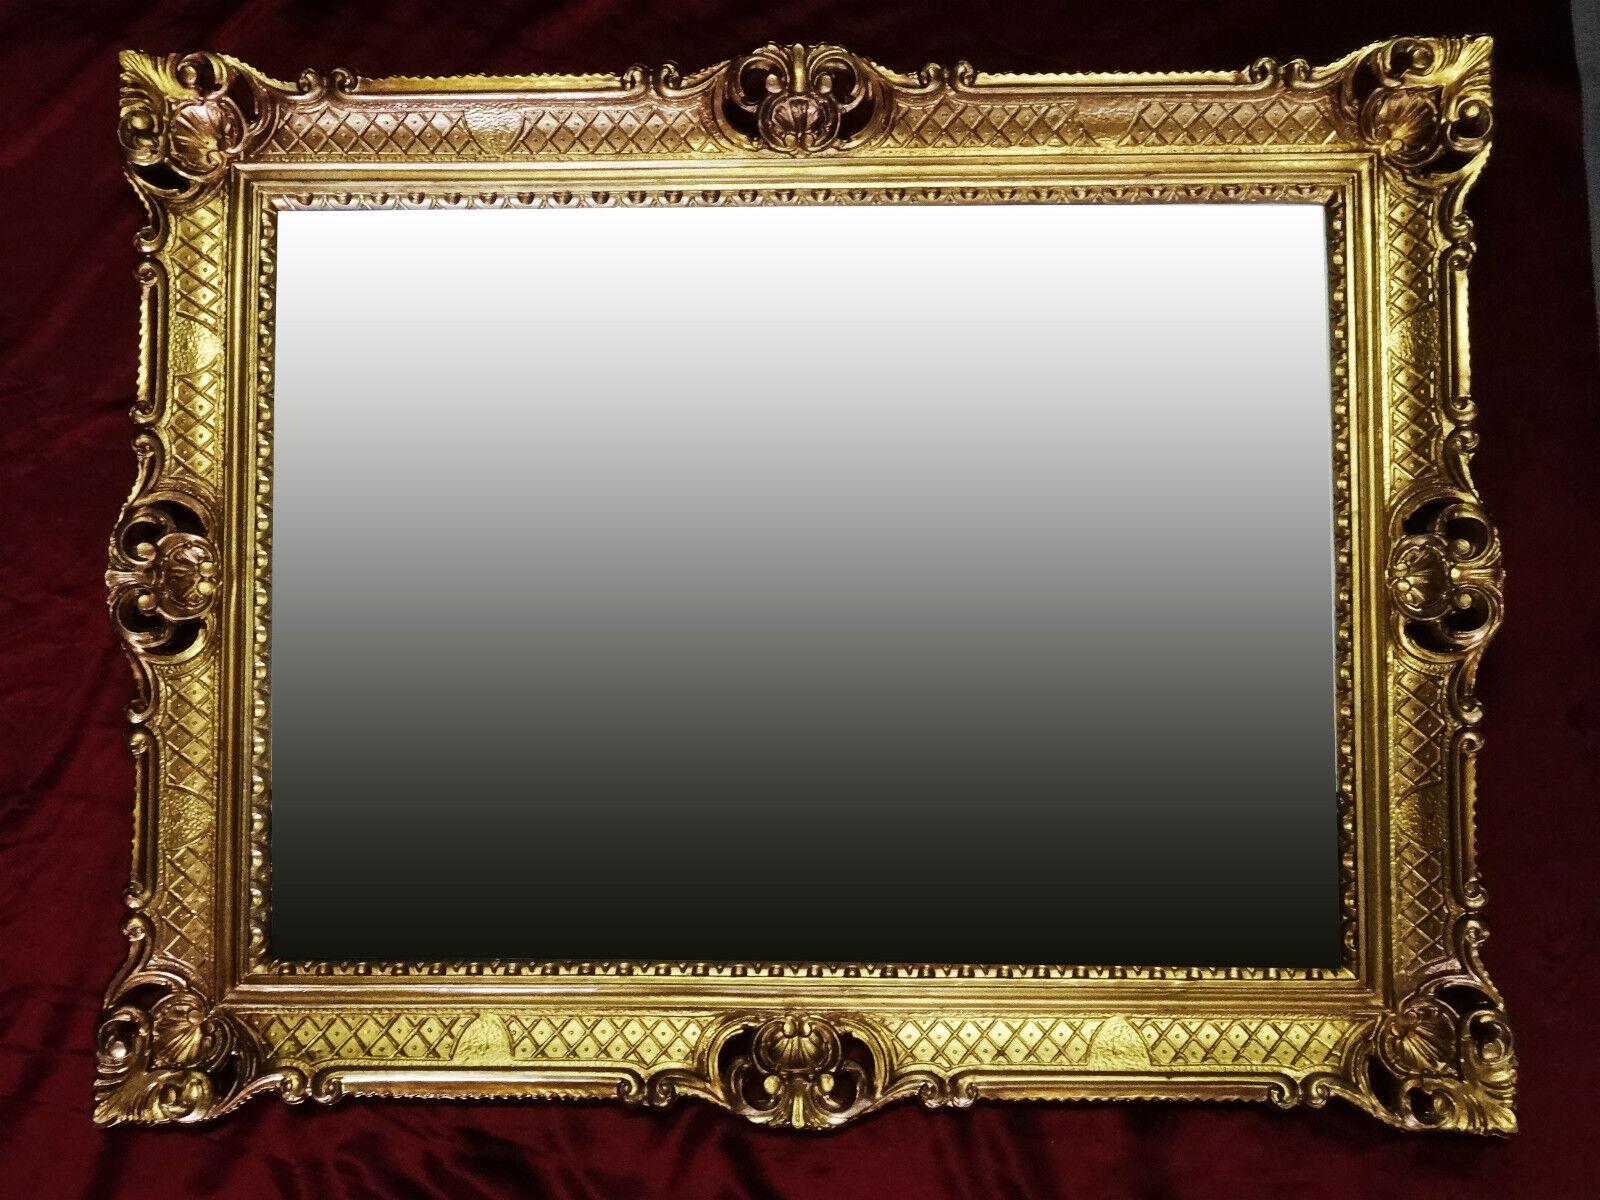 Barock wandspiegel gold antik rokoko 90x70 cm renaissance for Couchtisch 90x70